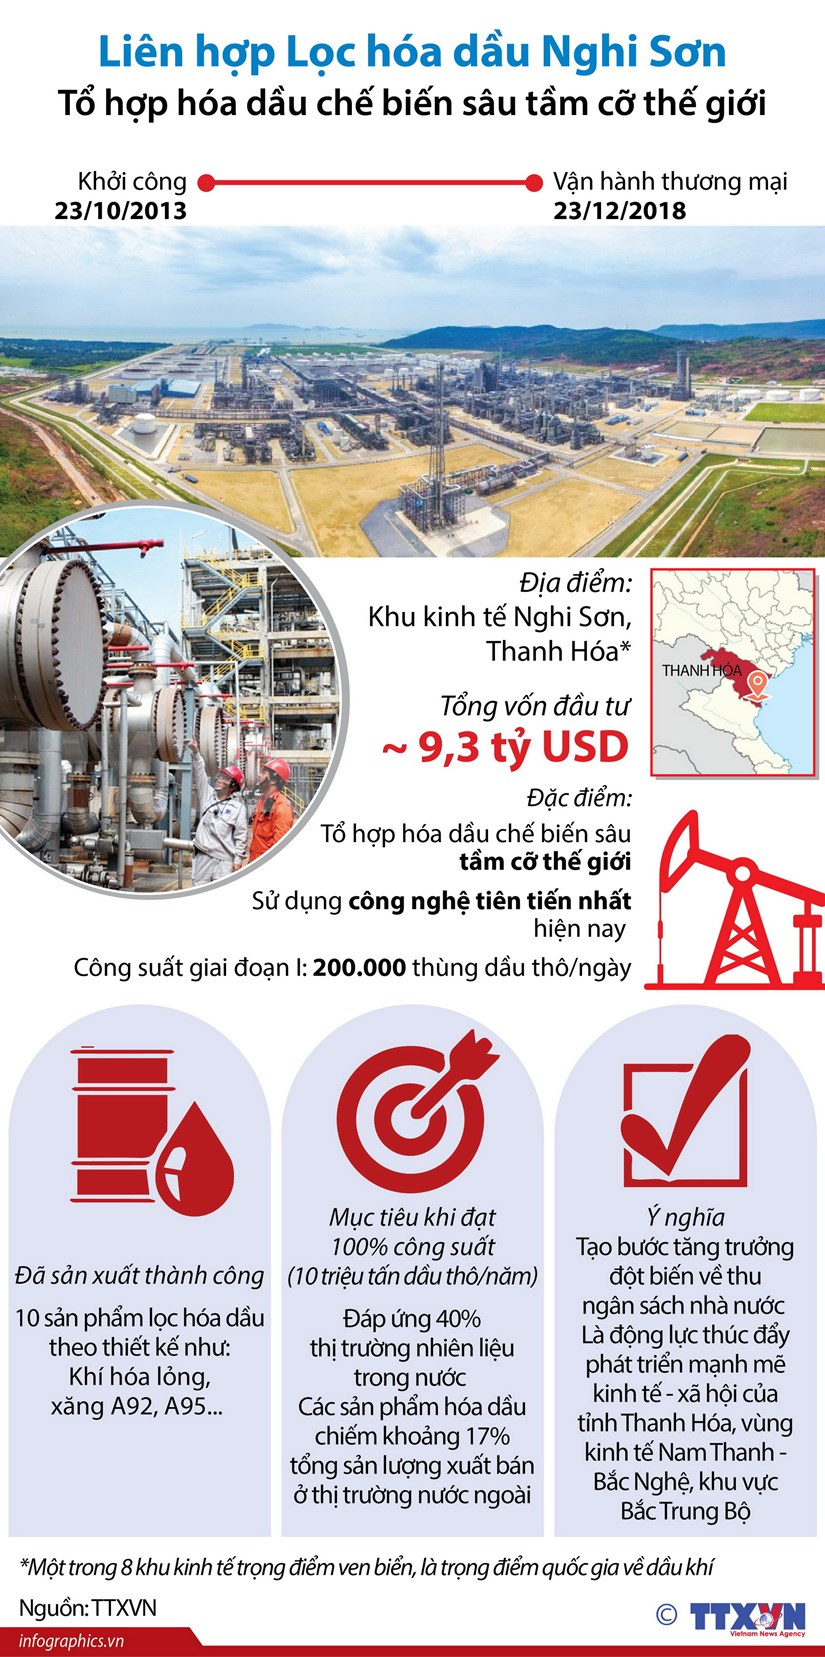 [Infographics] Chinh thuc van hanh Lien hop Loc hoa dau Nghi Son hinh anh 1